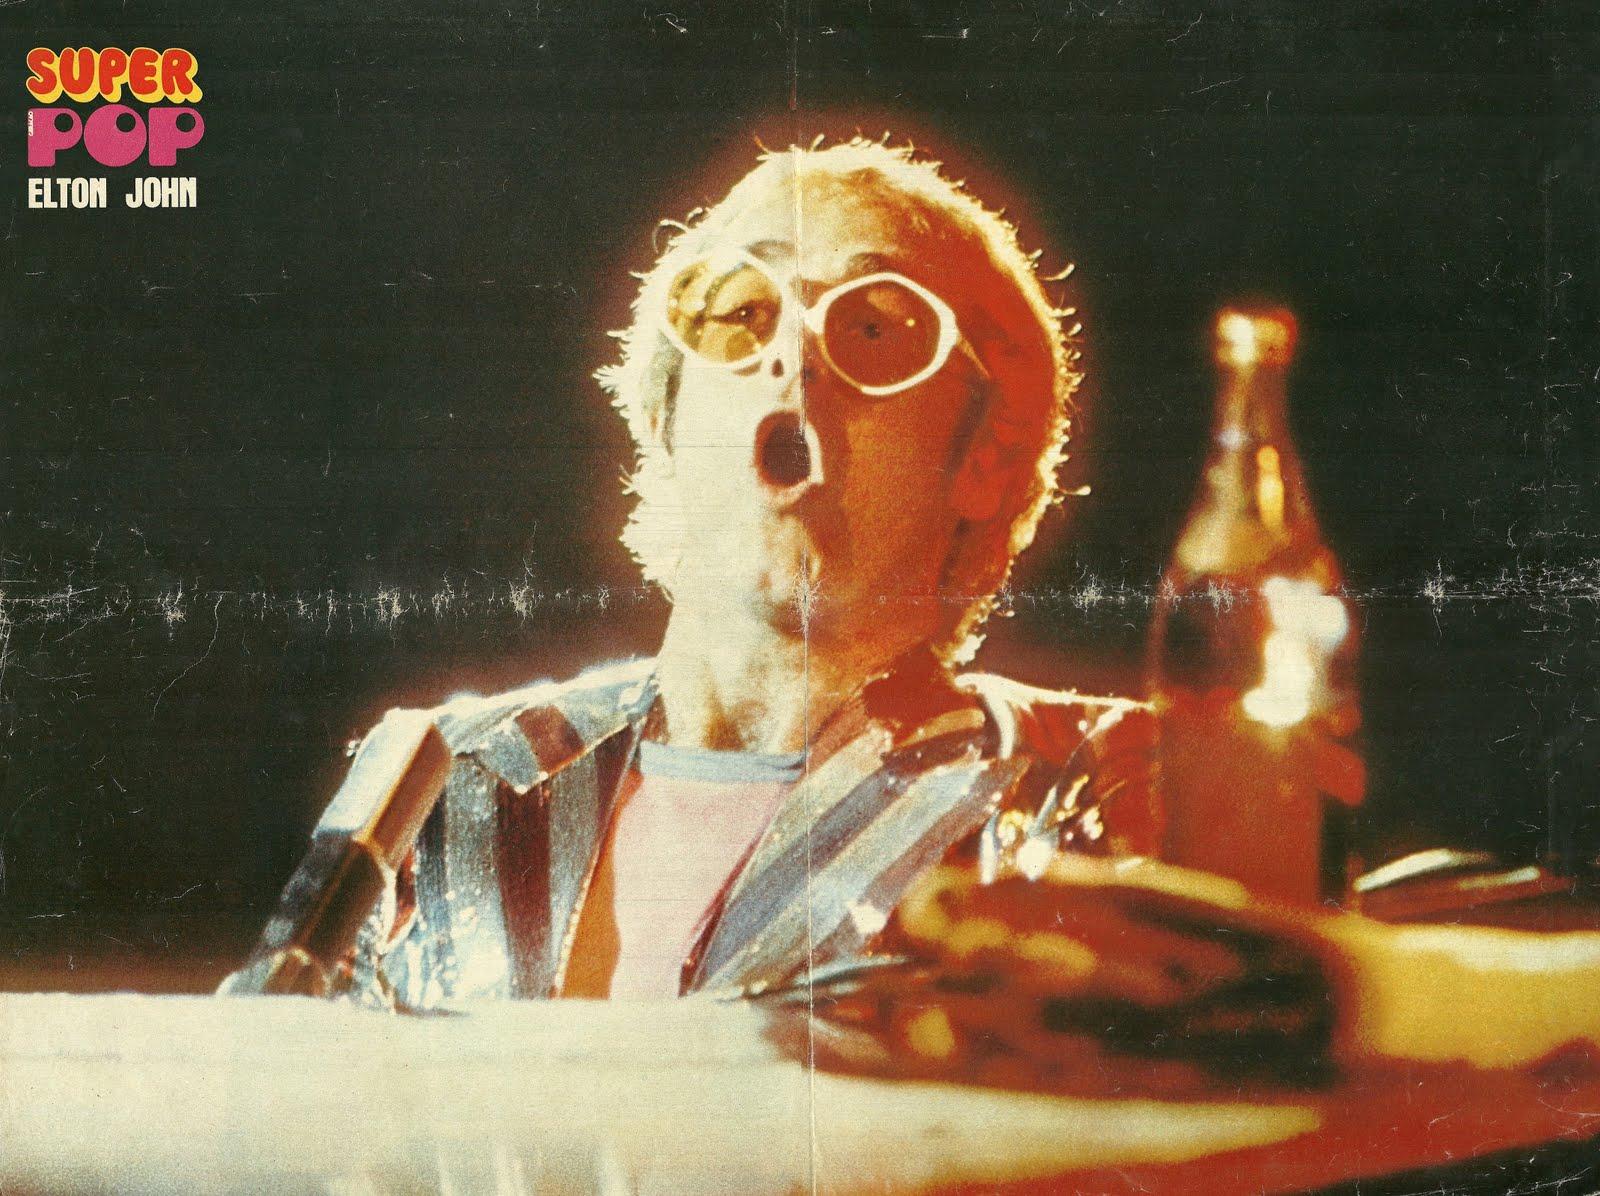 http://1.bp.blogspot.com/---dNOtX4jW8/TdBpbA2keJI/AAAAAAAAEDI/aMaSpYRA9es/s1600/Elton+John%252C+Super+poster+-+Super+Pop+1973-06.jpg